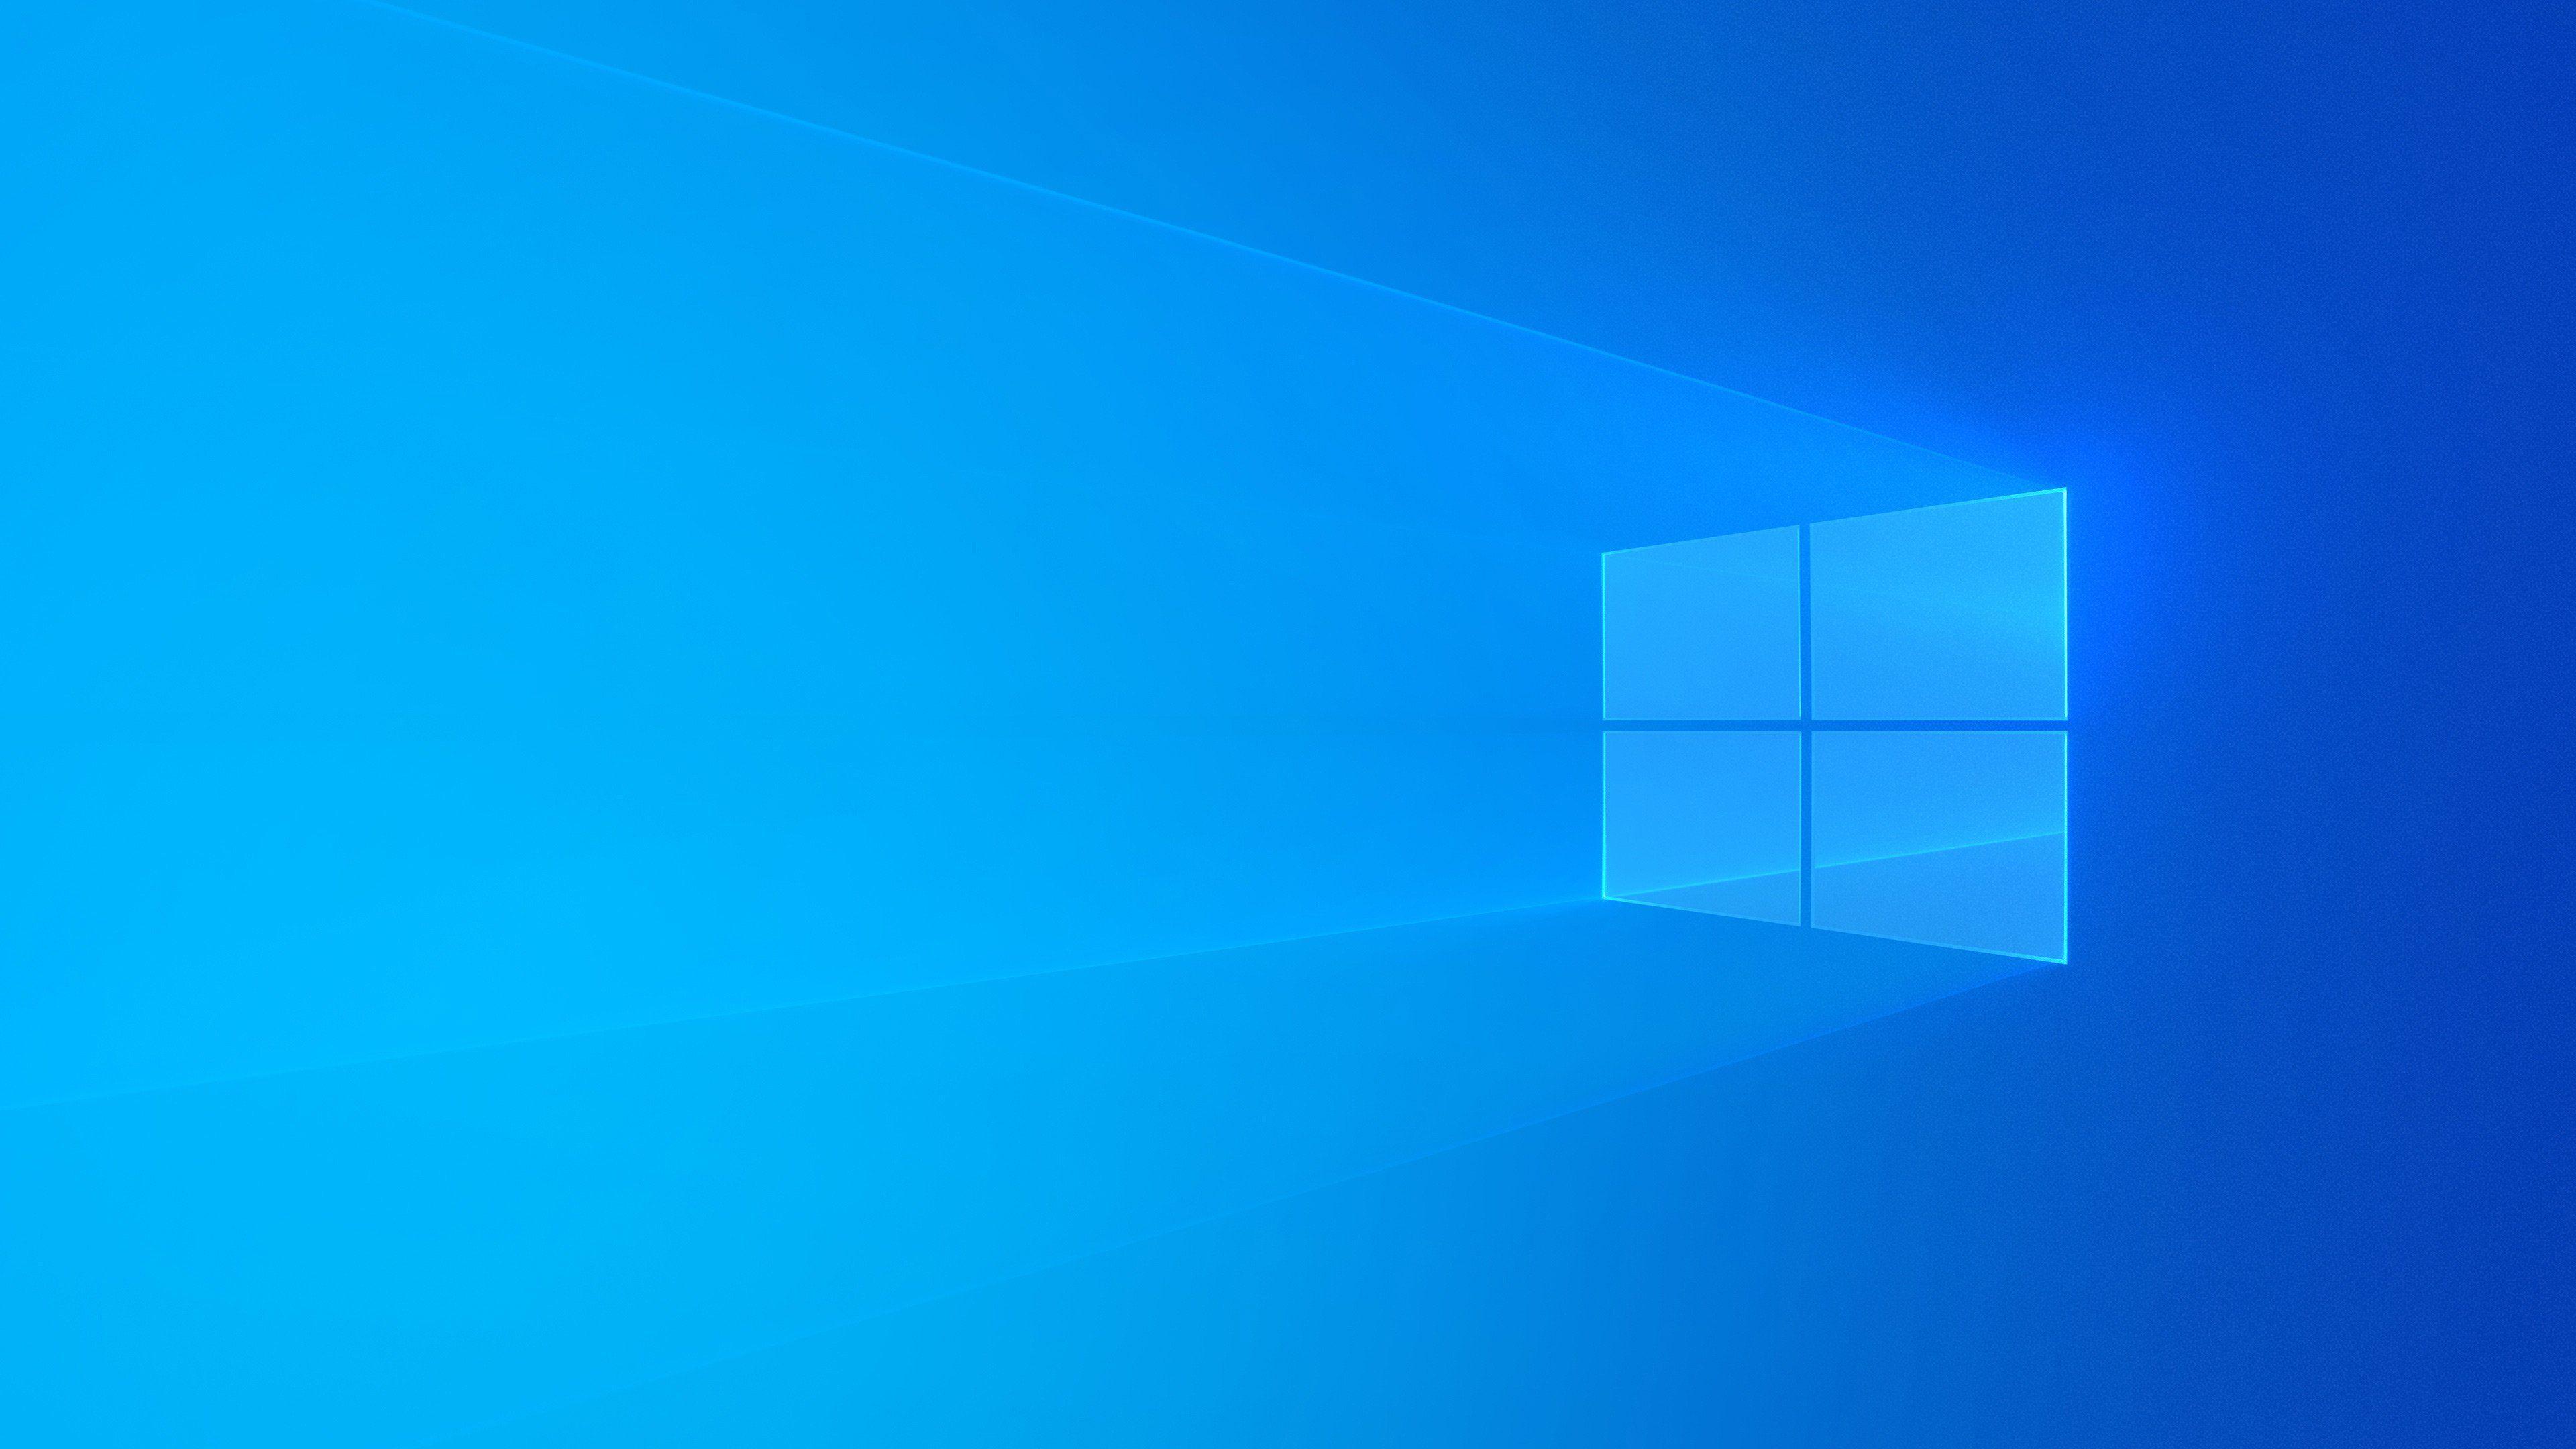 New Windows 10 Light Theme Wallpaper Lorem ipsum, Microsoft